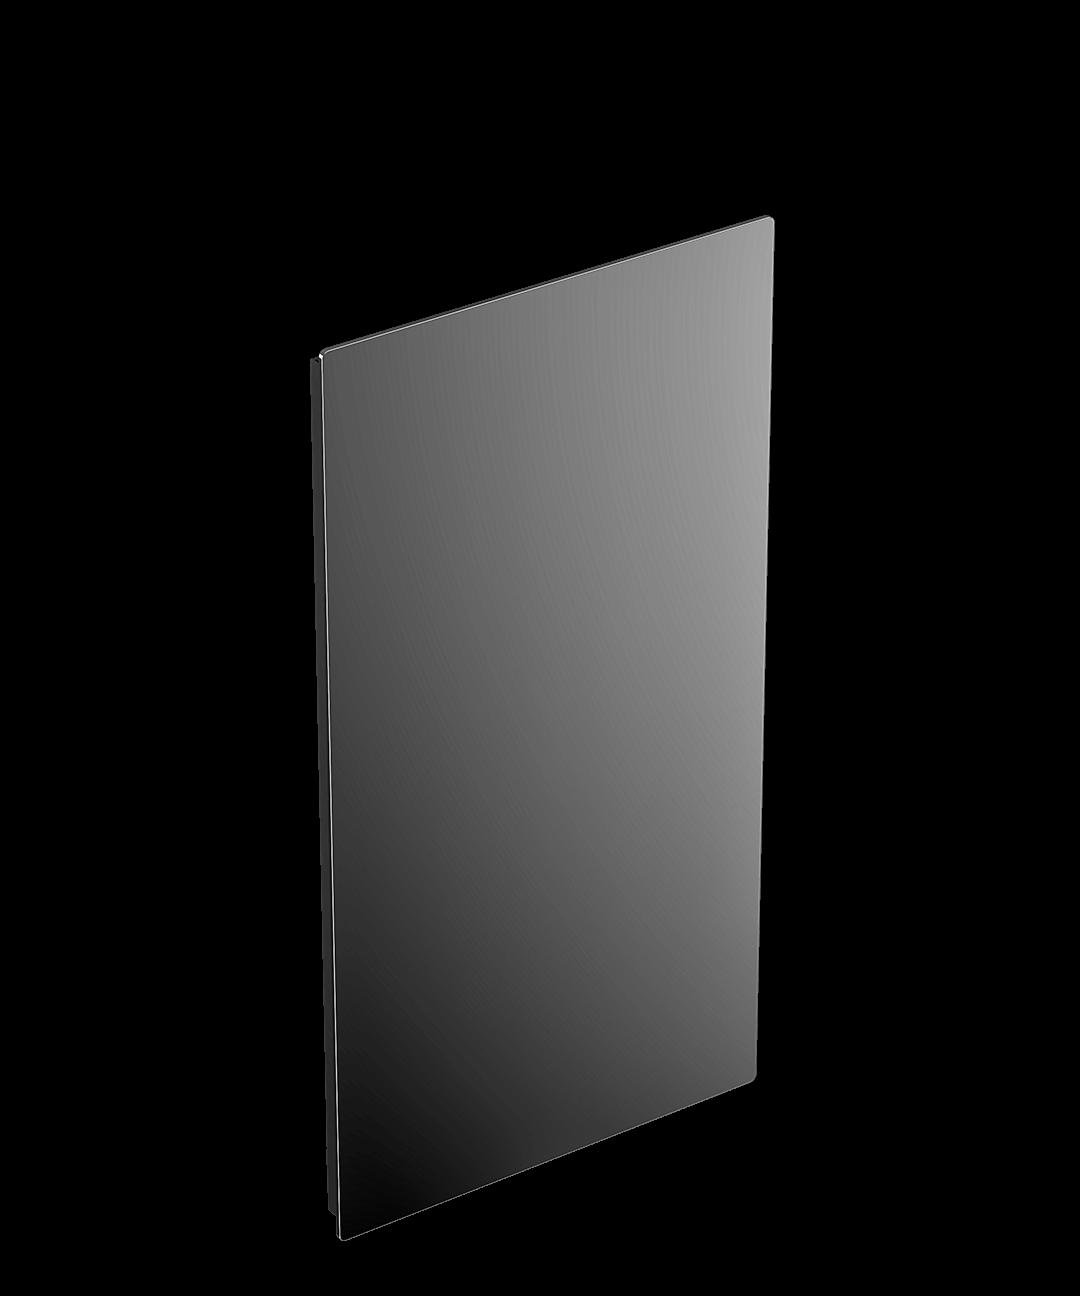 XPO Screens Invite 24PT Frameless - Mirror Material